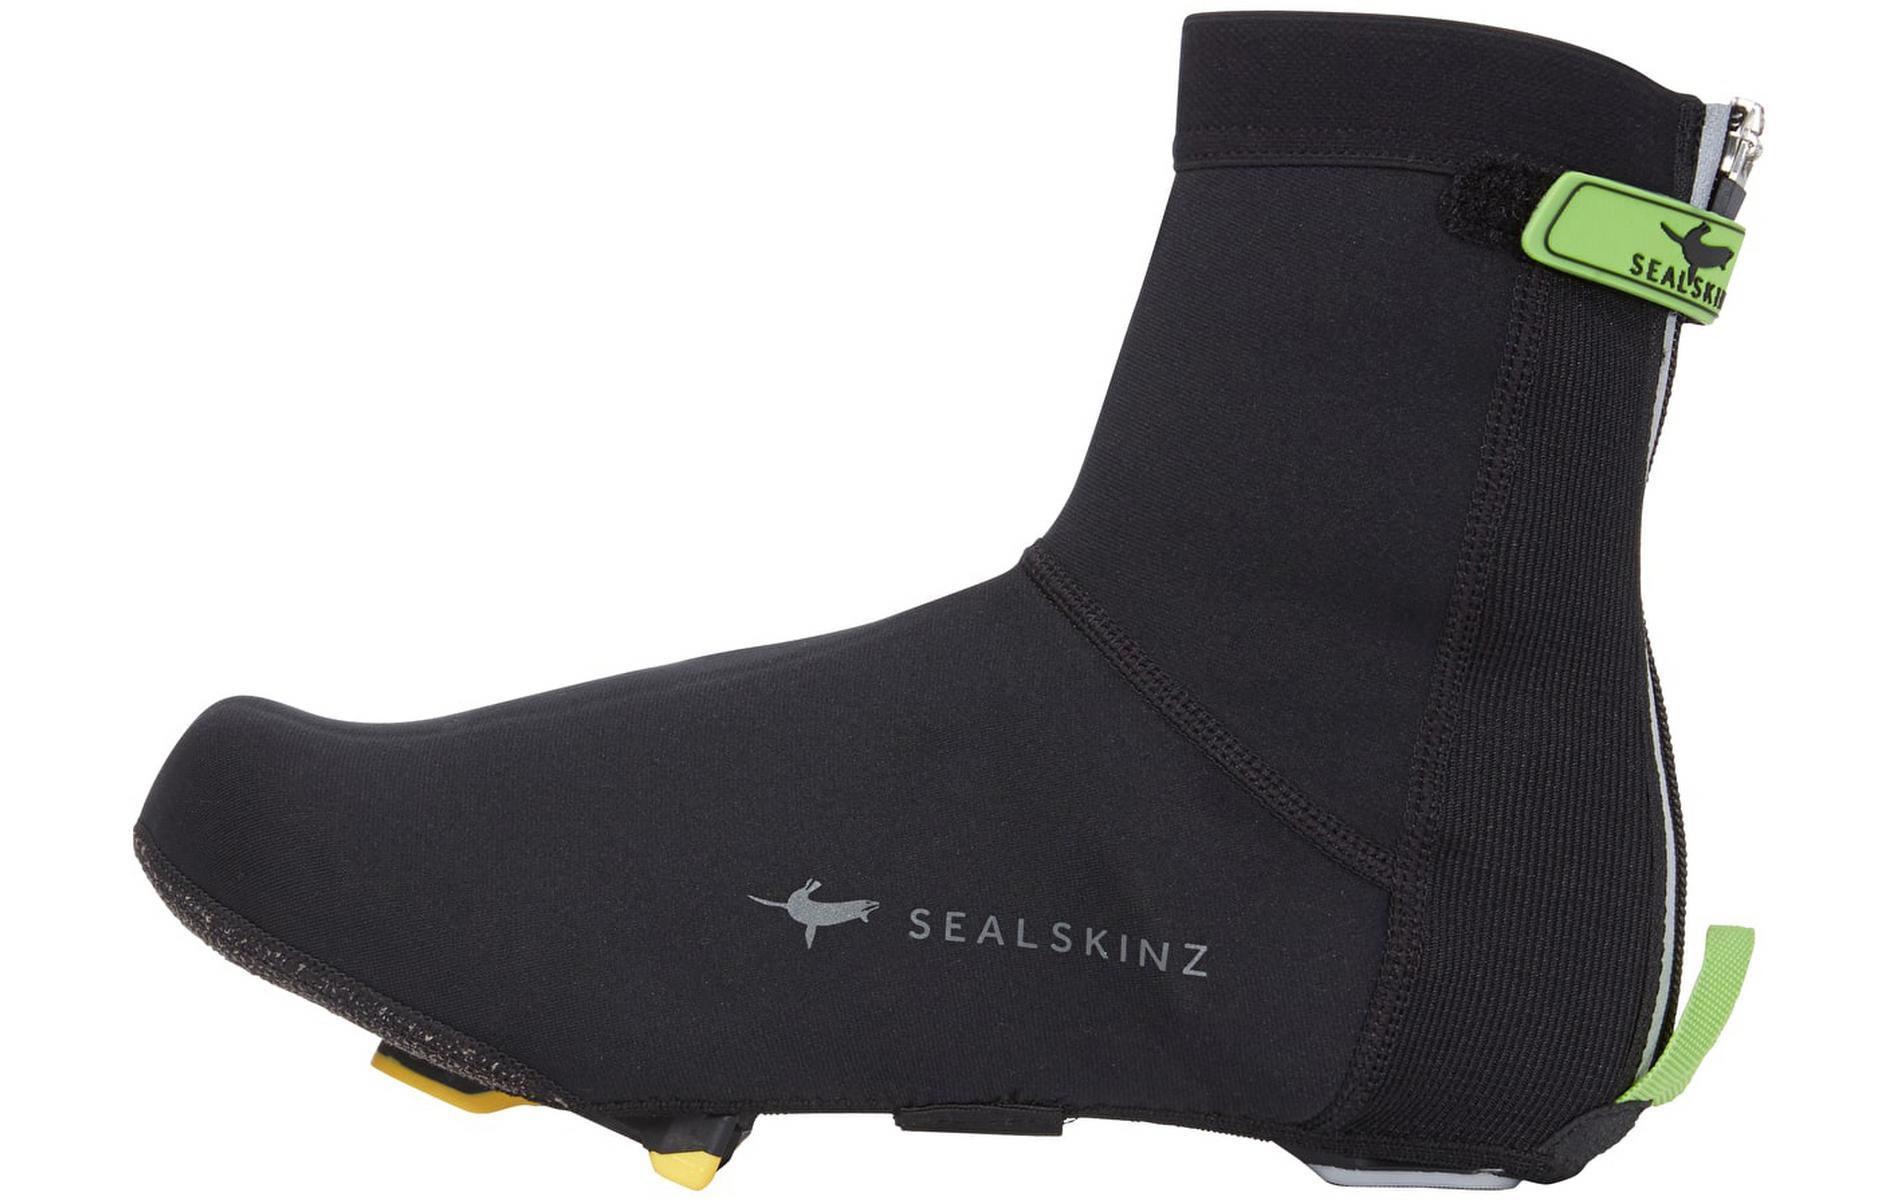 Sealskinz Neo Open Overshoes, Black, L